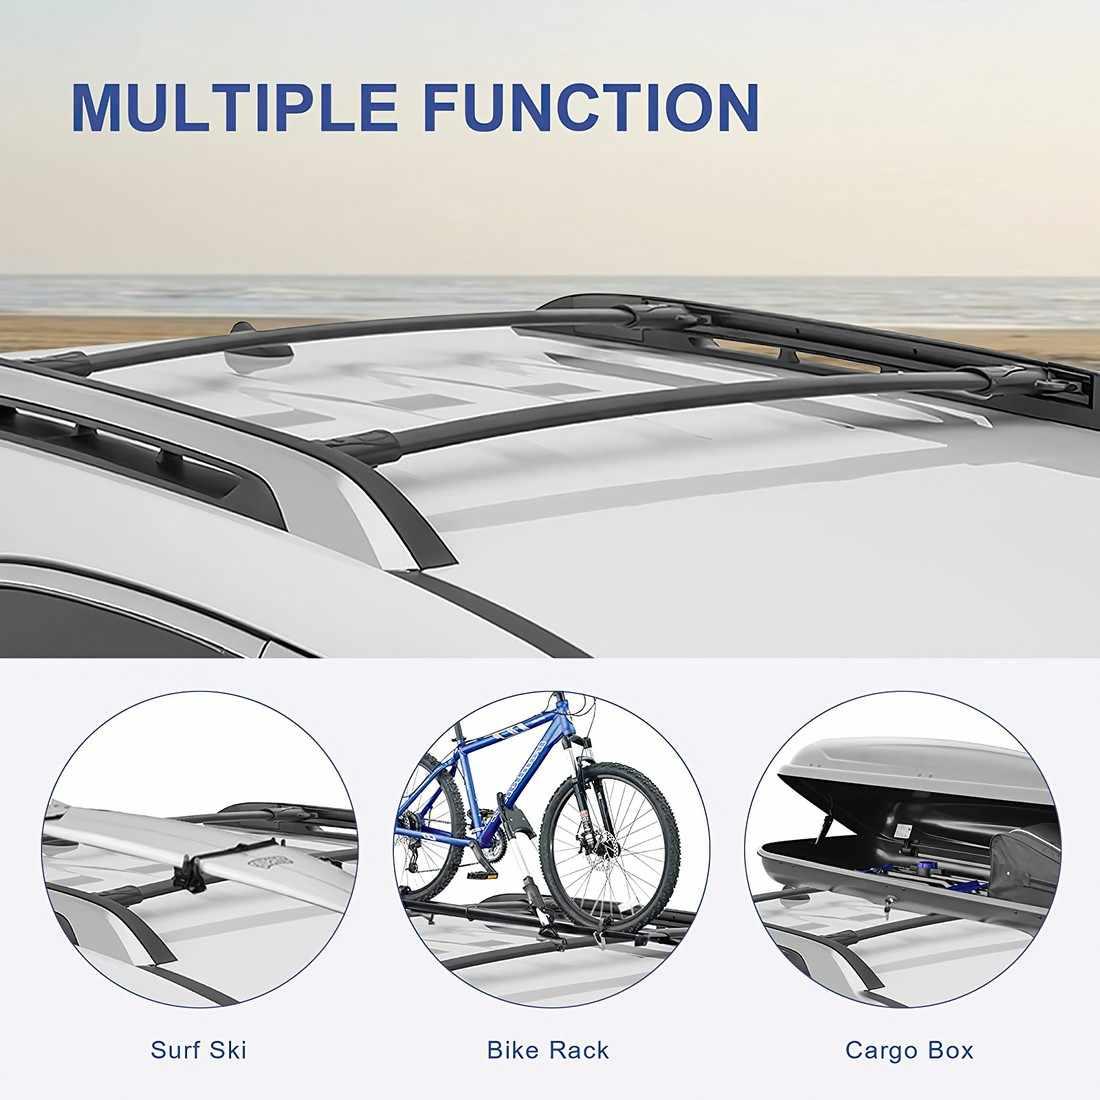 sanjods roof rack cross bar rail compatible for chevy equinox gmc terrain 2010 2011 2012 2013 2014 2015 2016 2017 cargo racks